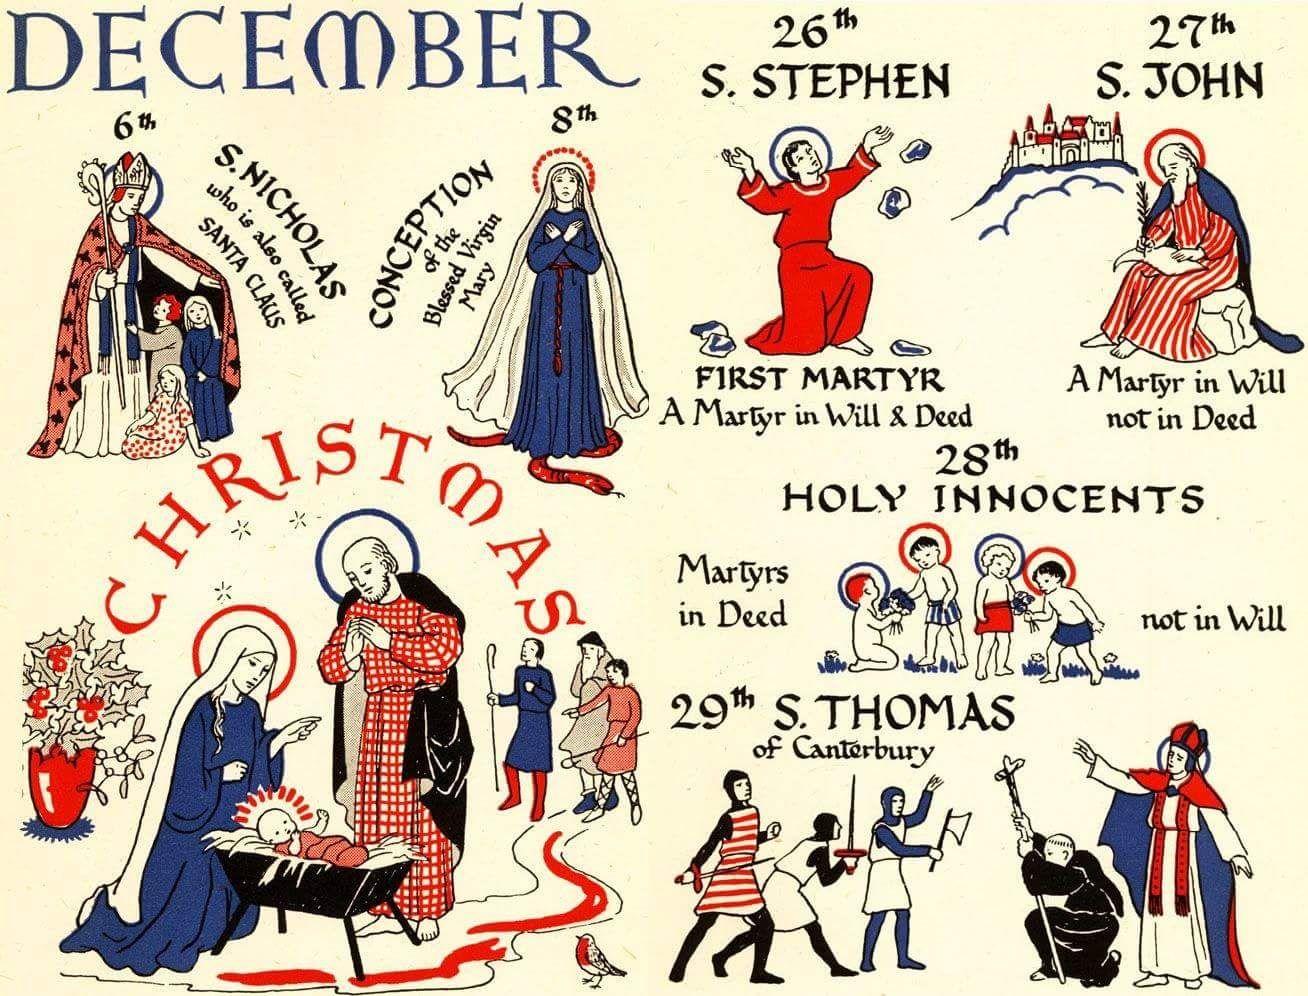 Traditional Roman Catholicism Catholic Devotions And